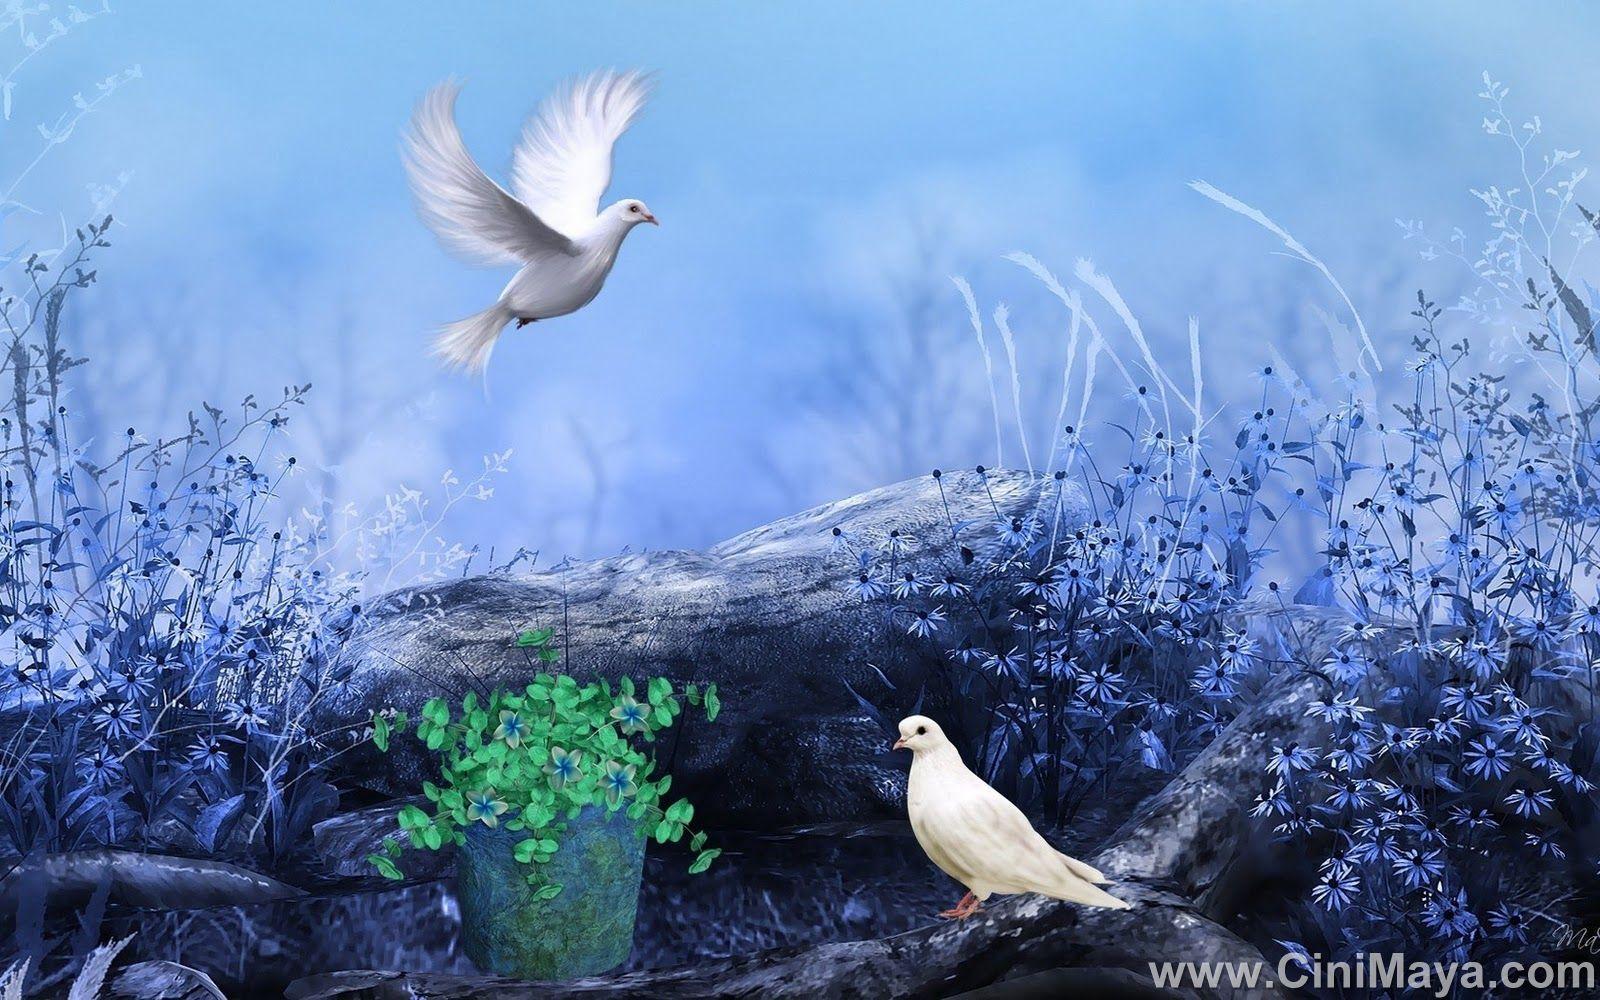 Hd wallpaper qmobile - Hd Nature Hd Wallpaper Beautiful Nature